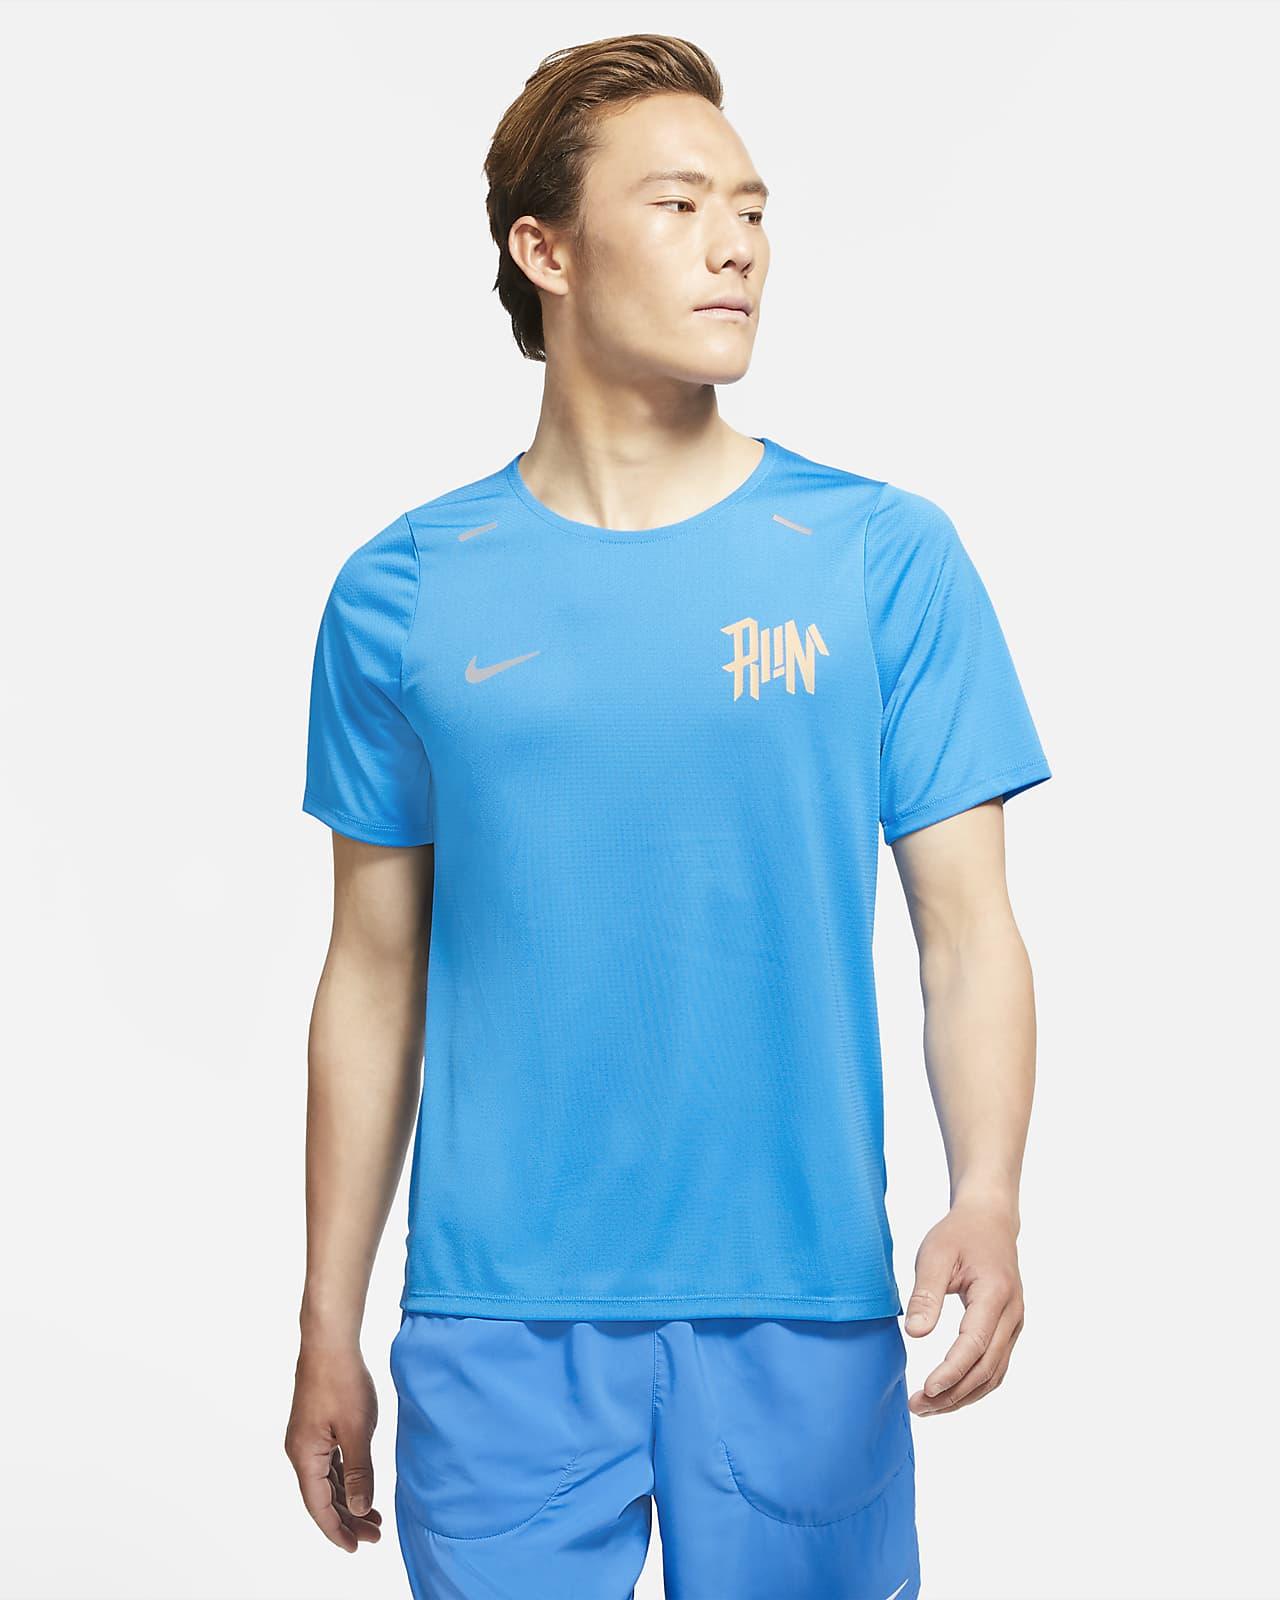 Nike Dri-FIT Rise 365 Wild Run Men's Running Top